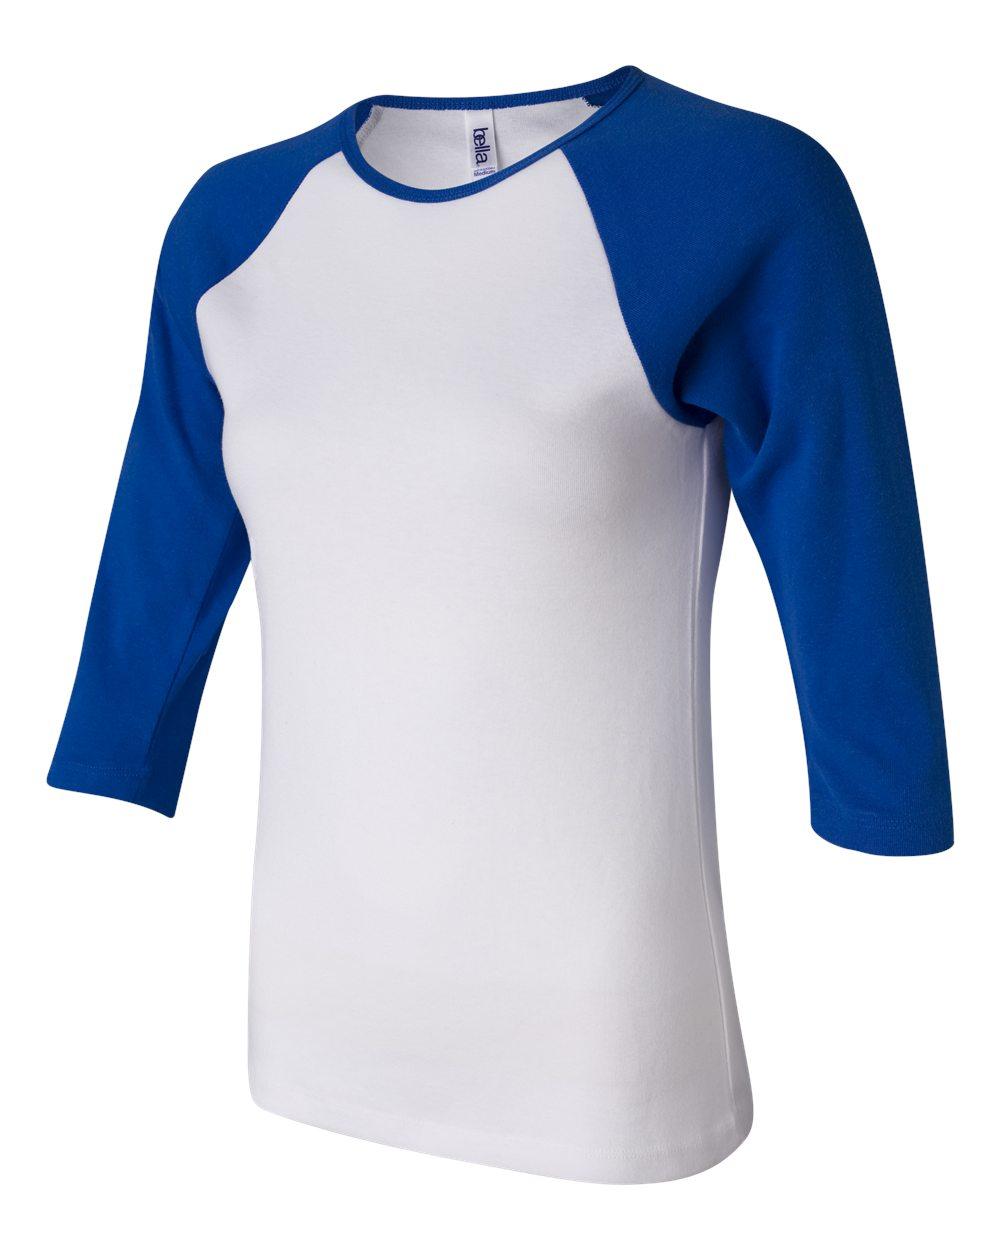 Bella-Canvas-Womens-Stretch-Rib-3-4-Sleeve-Contrast-Raglan-T-Shirt-B2000 thumbnail 28